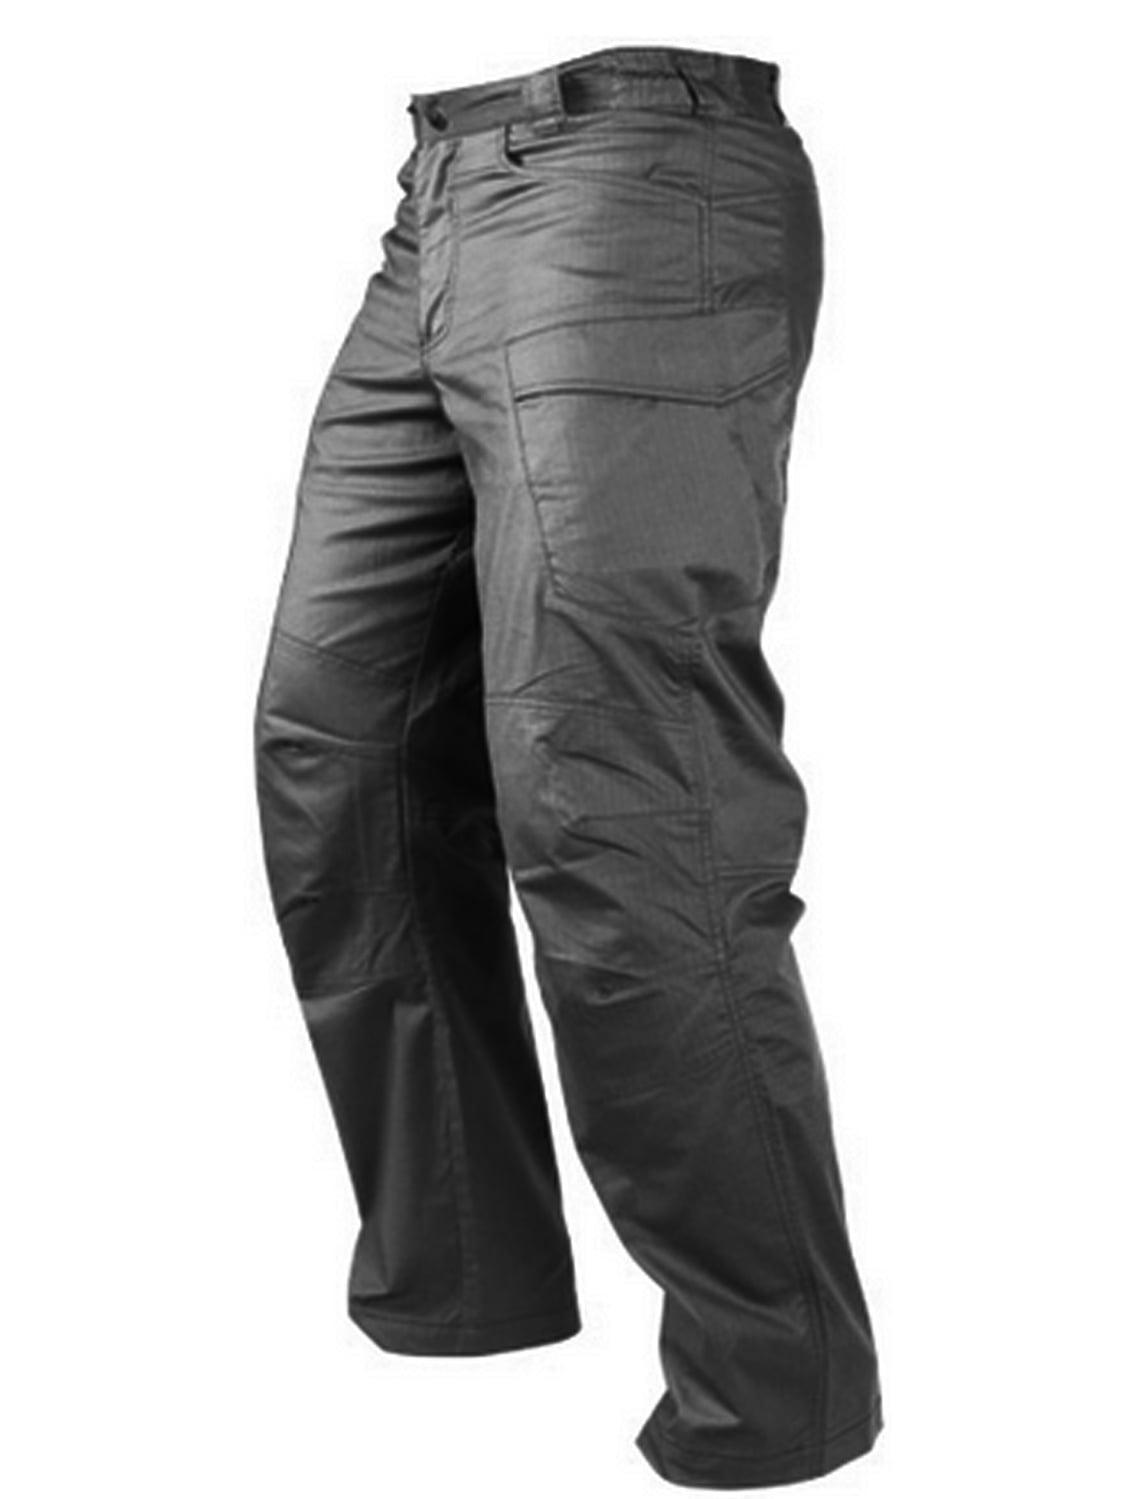 OD 32W X 32L SENTINEL TACTICAL PANTS